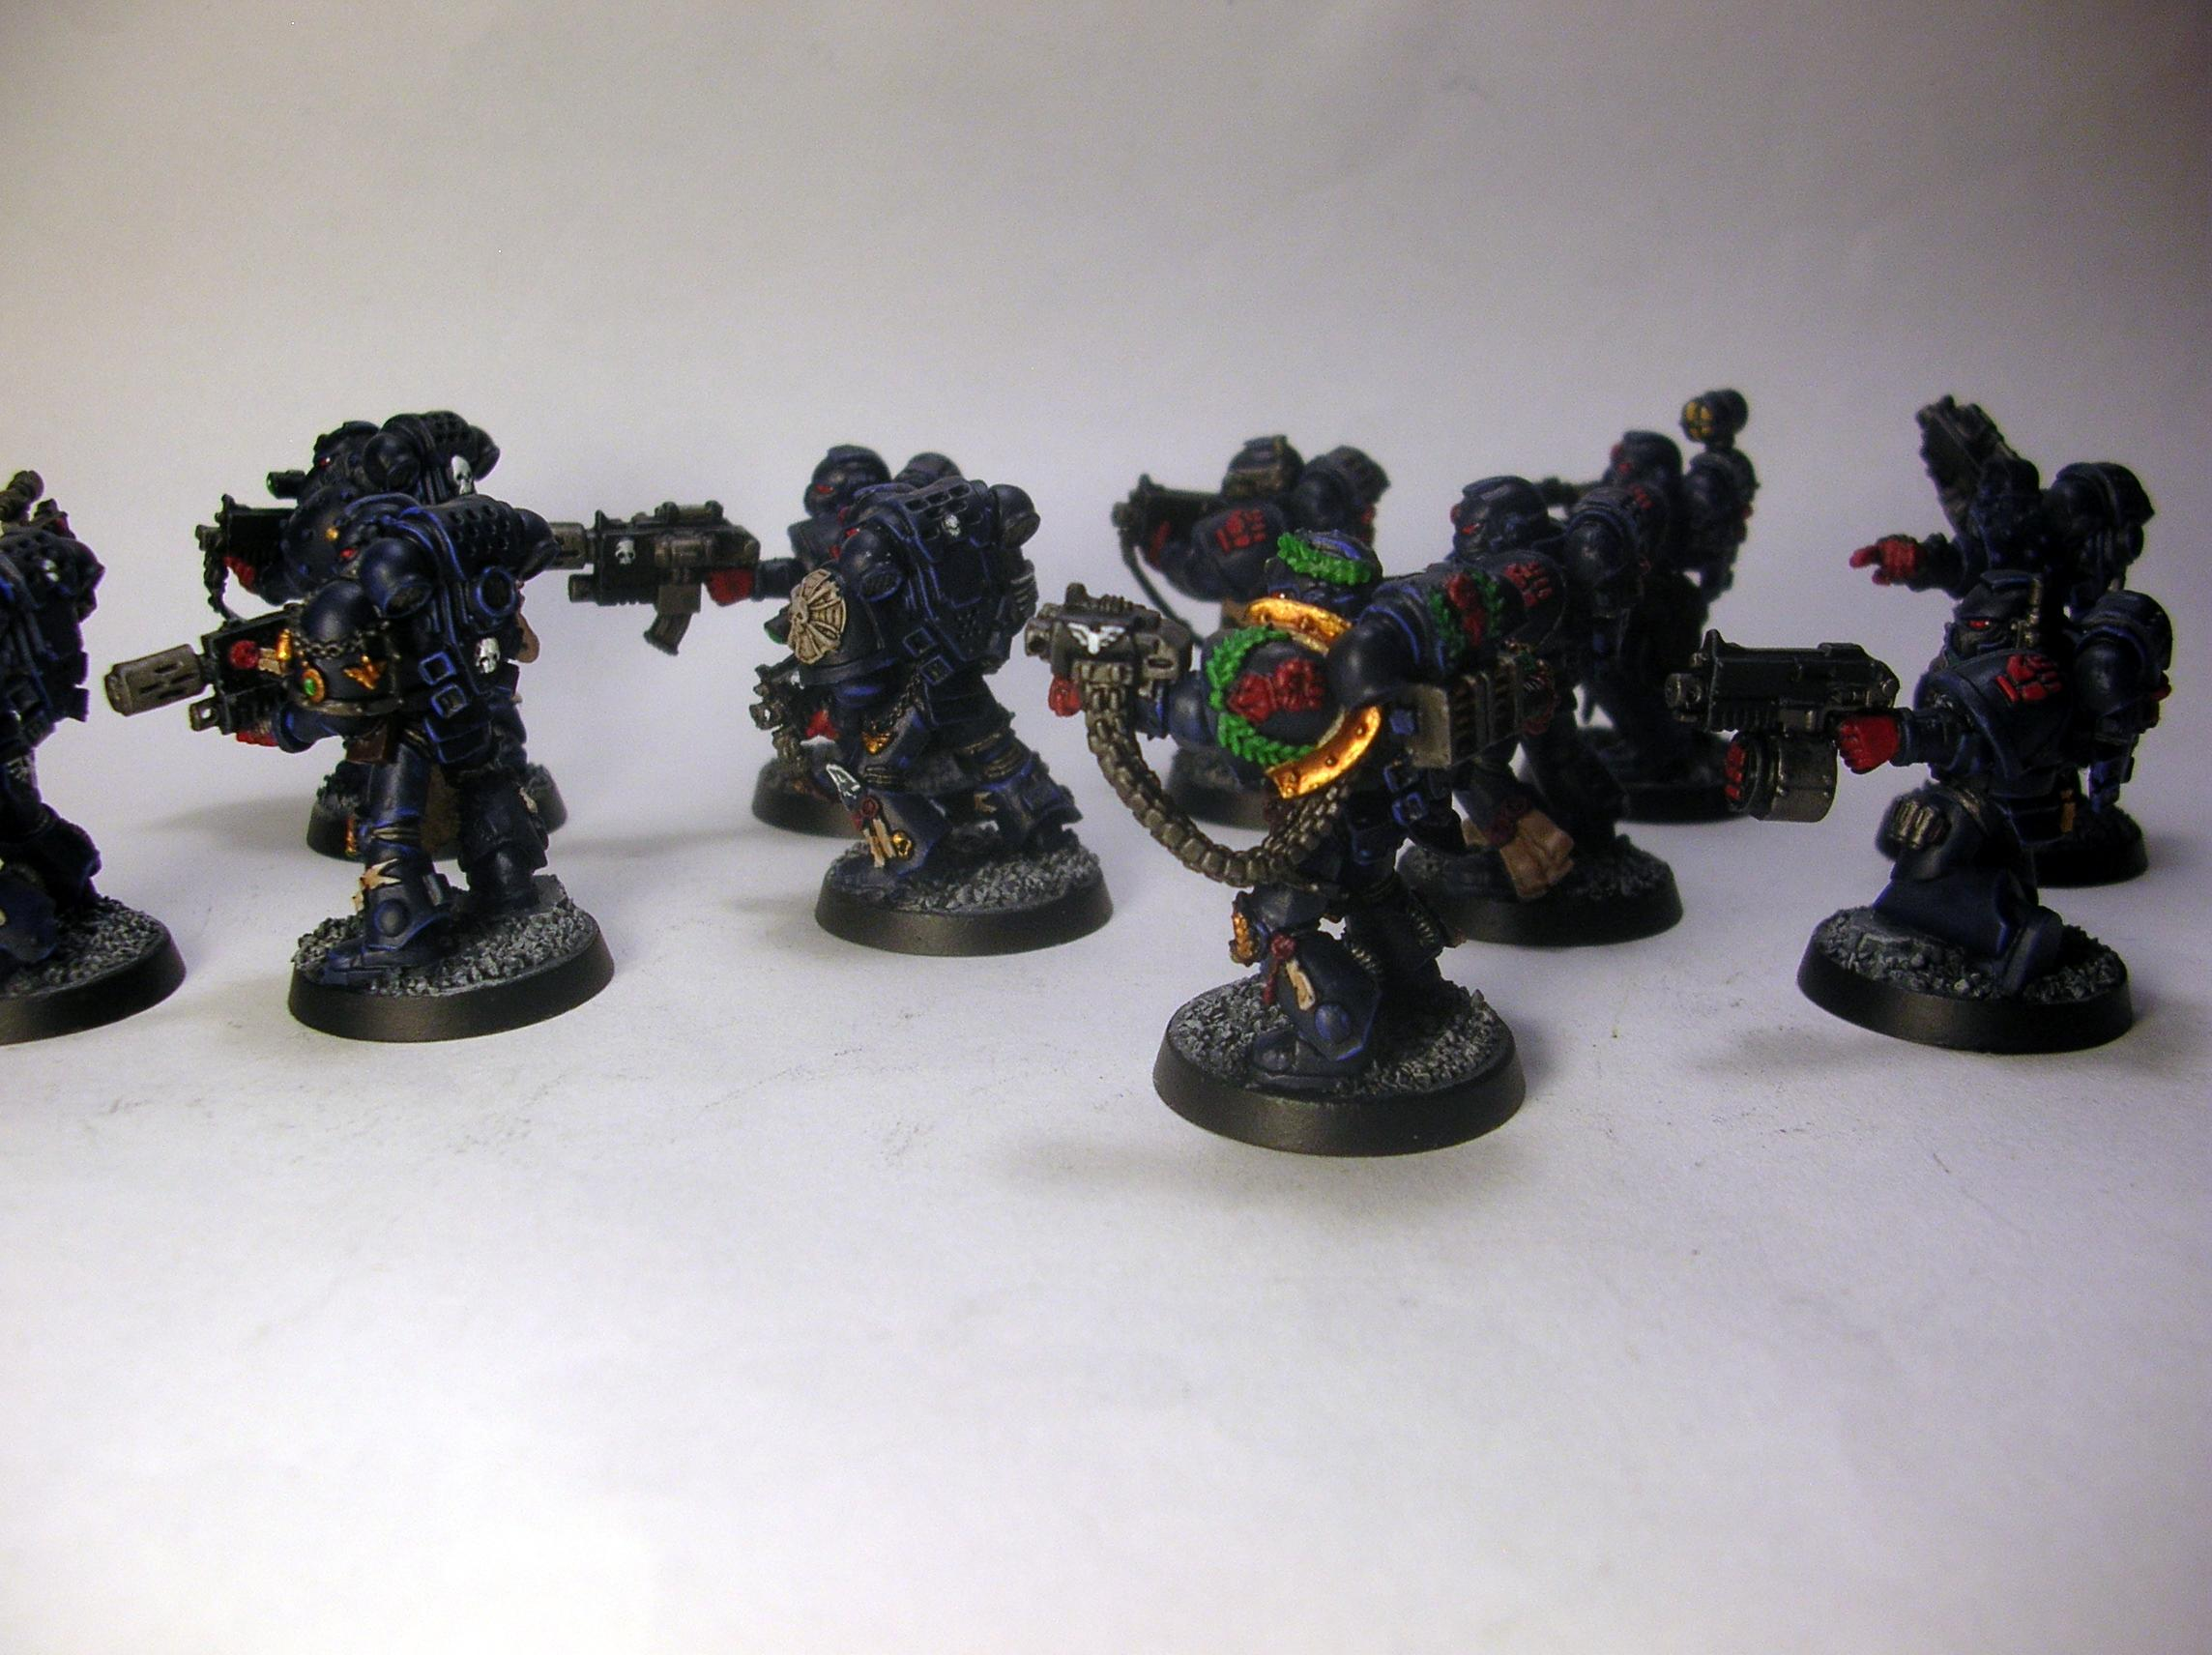 Crimson, Crimson Fists, Fists, Kantor, Pedro, Pedro Kantor, Space Marines, Sternguard